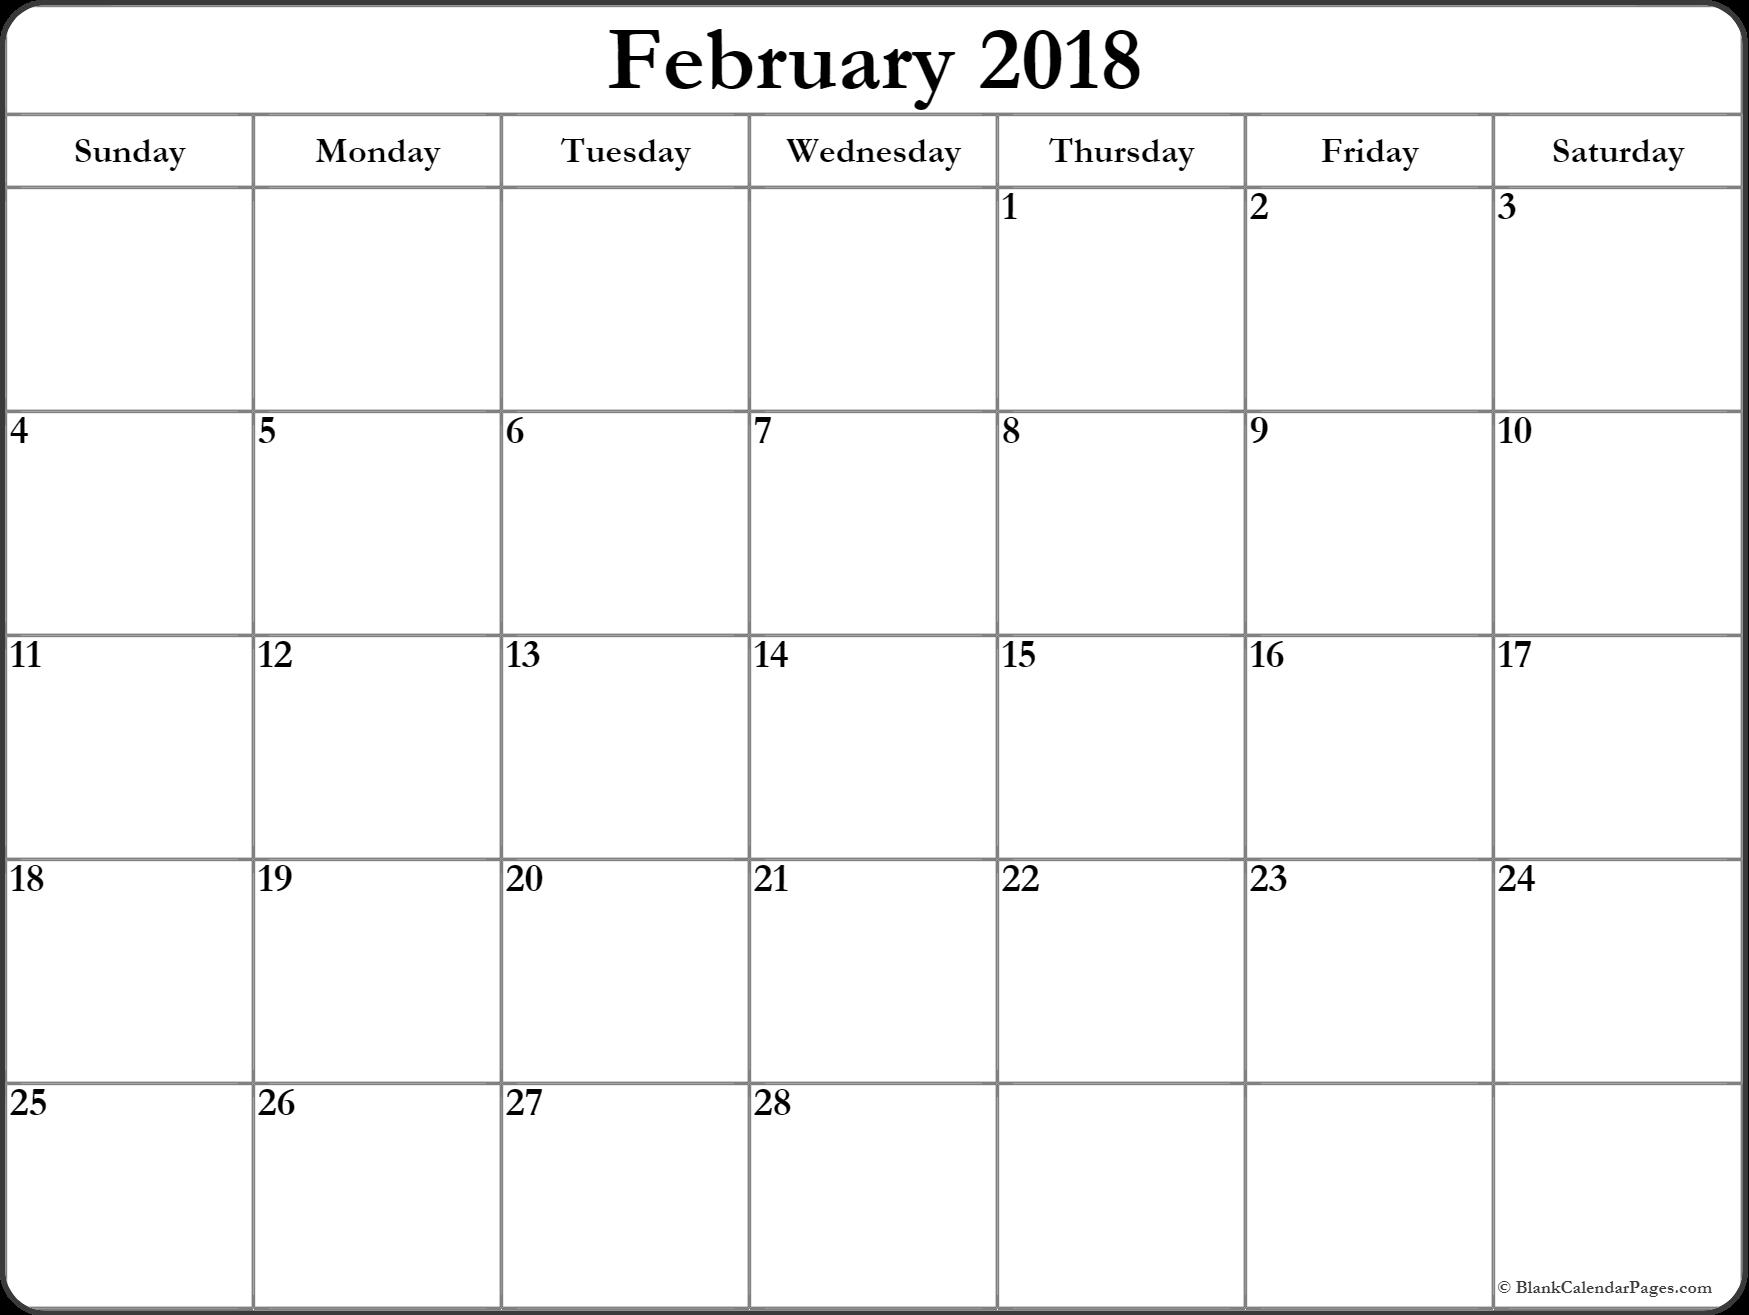 February Calendar  Printable And Free Blank Calendar February